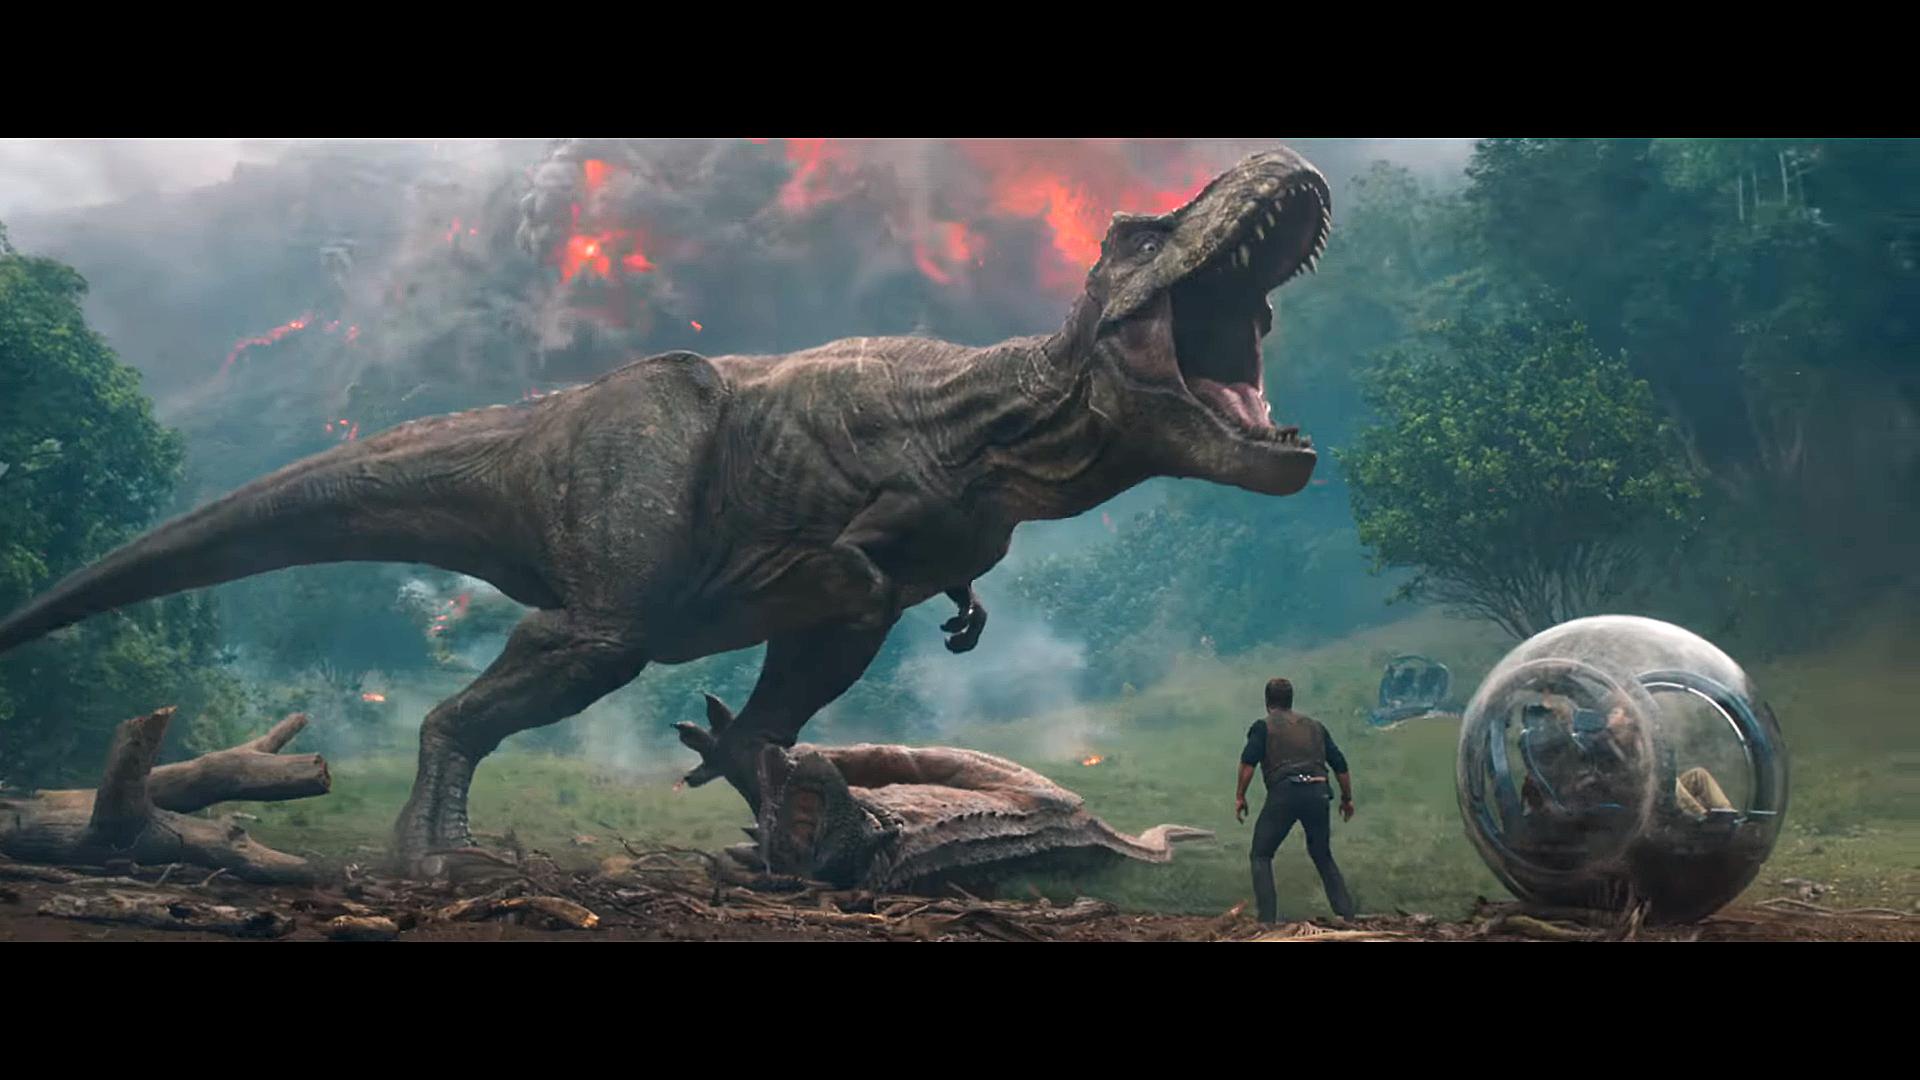 Jurassic World 2 Rexy Wallpaper [1920x1080]